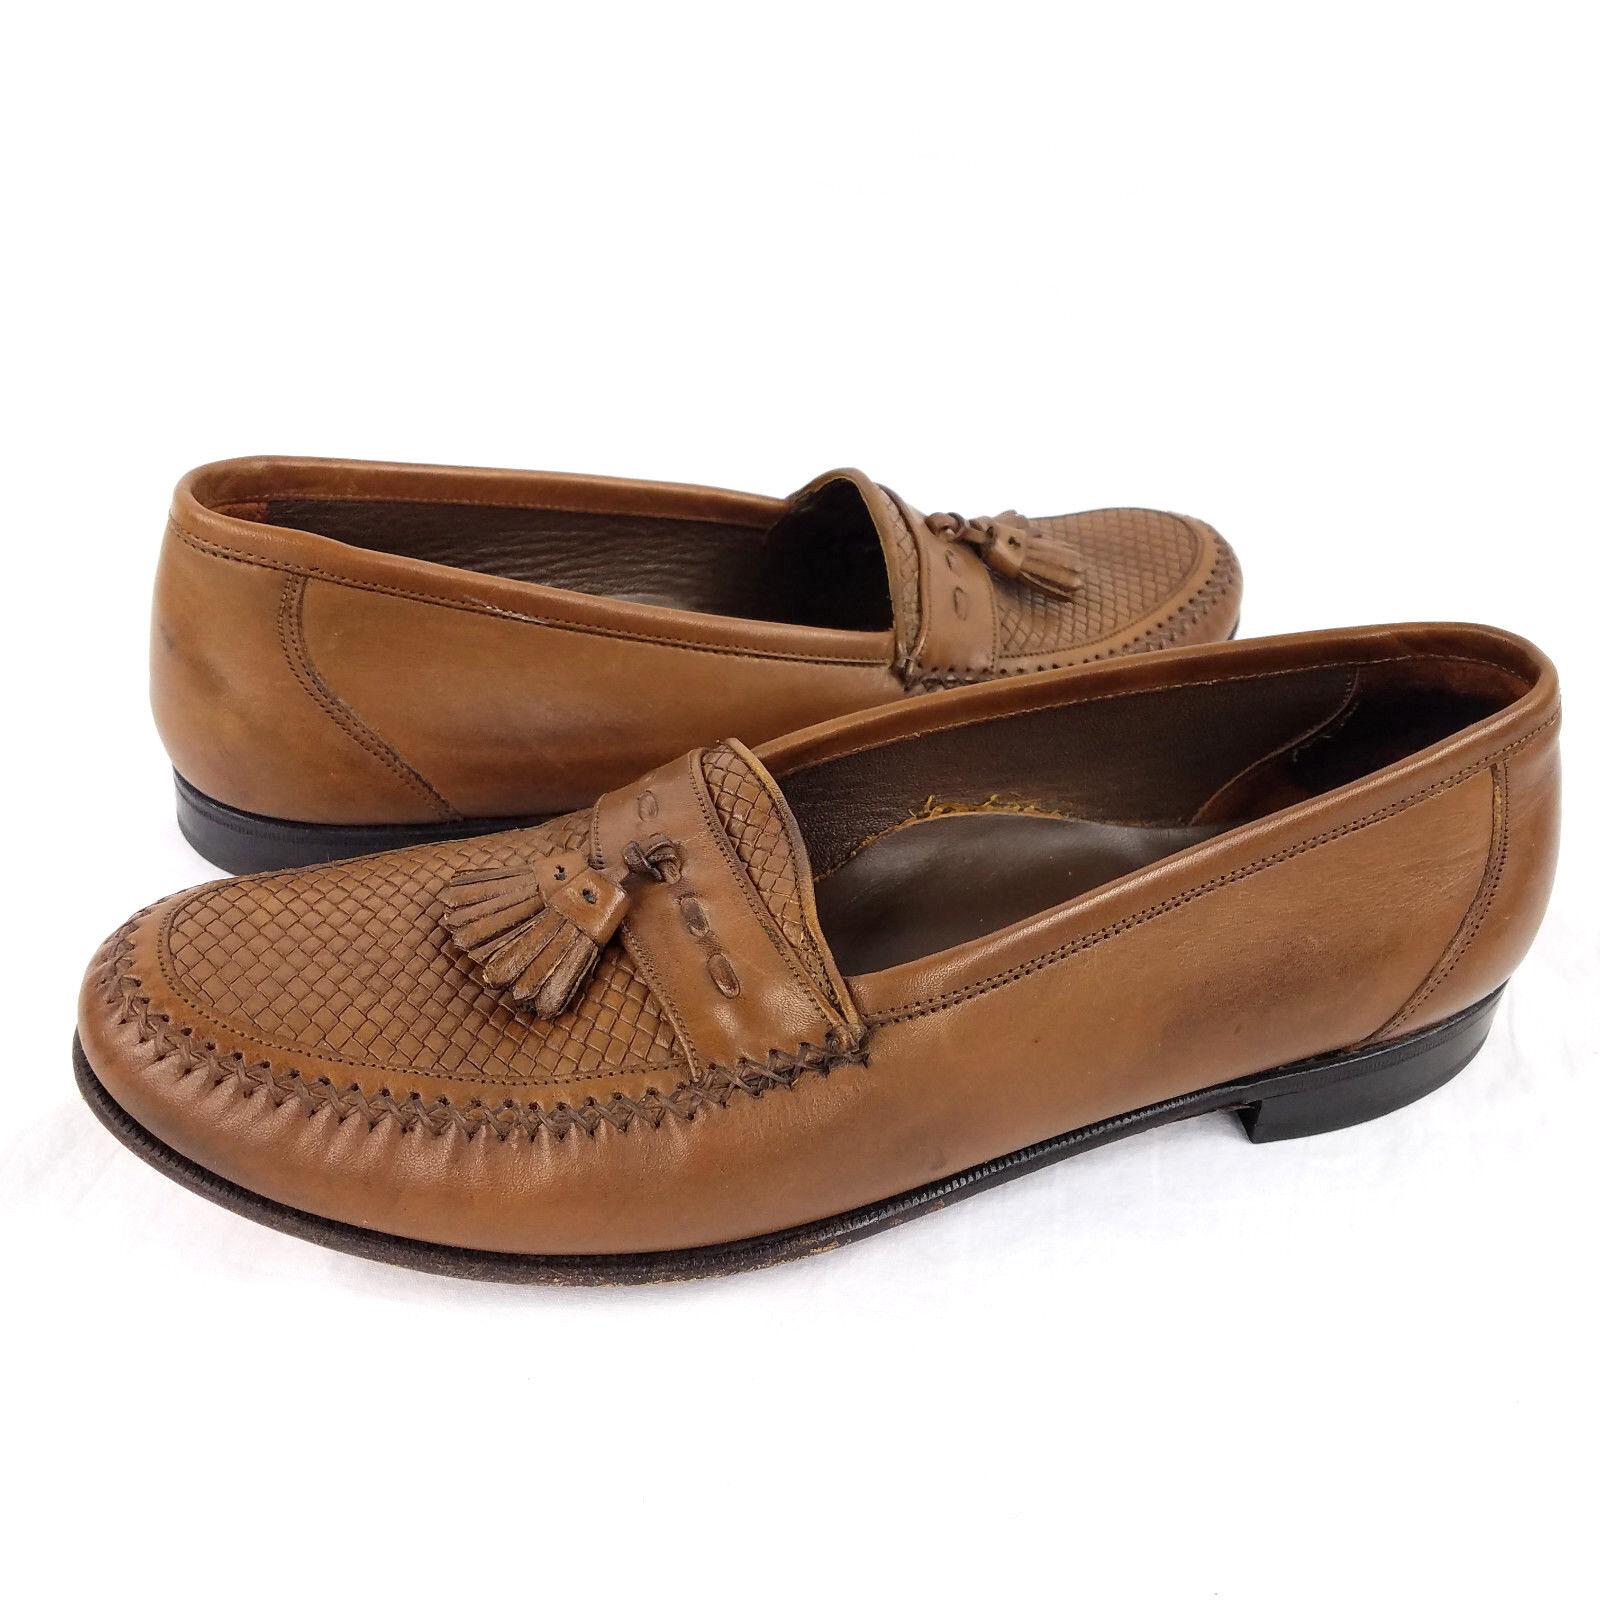 Florsheim Brown Leather Tassel Slip-On Woven Loafer Dress shoes, Mens Size 10.5D